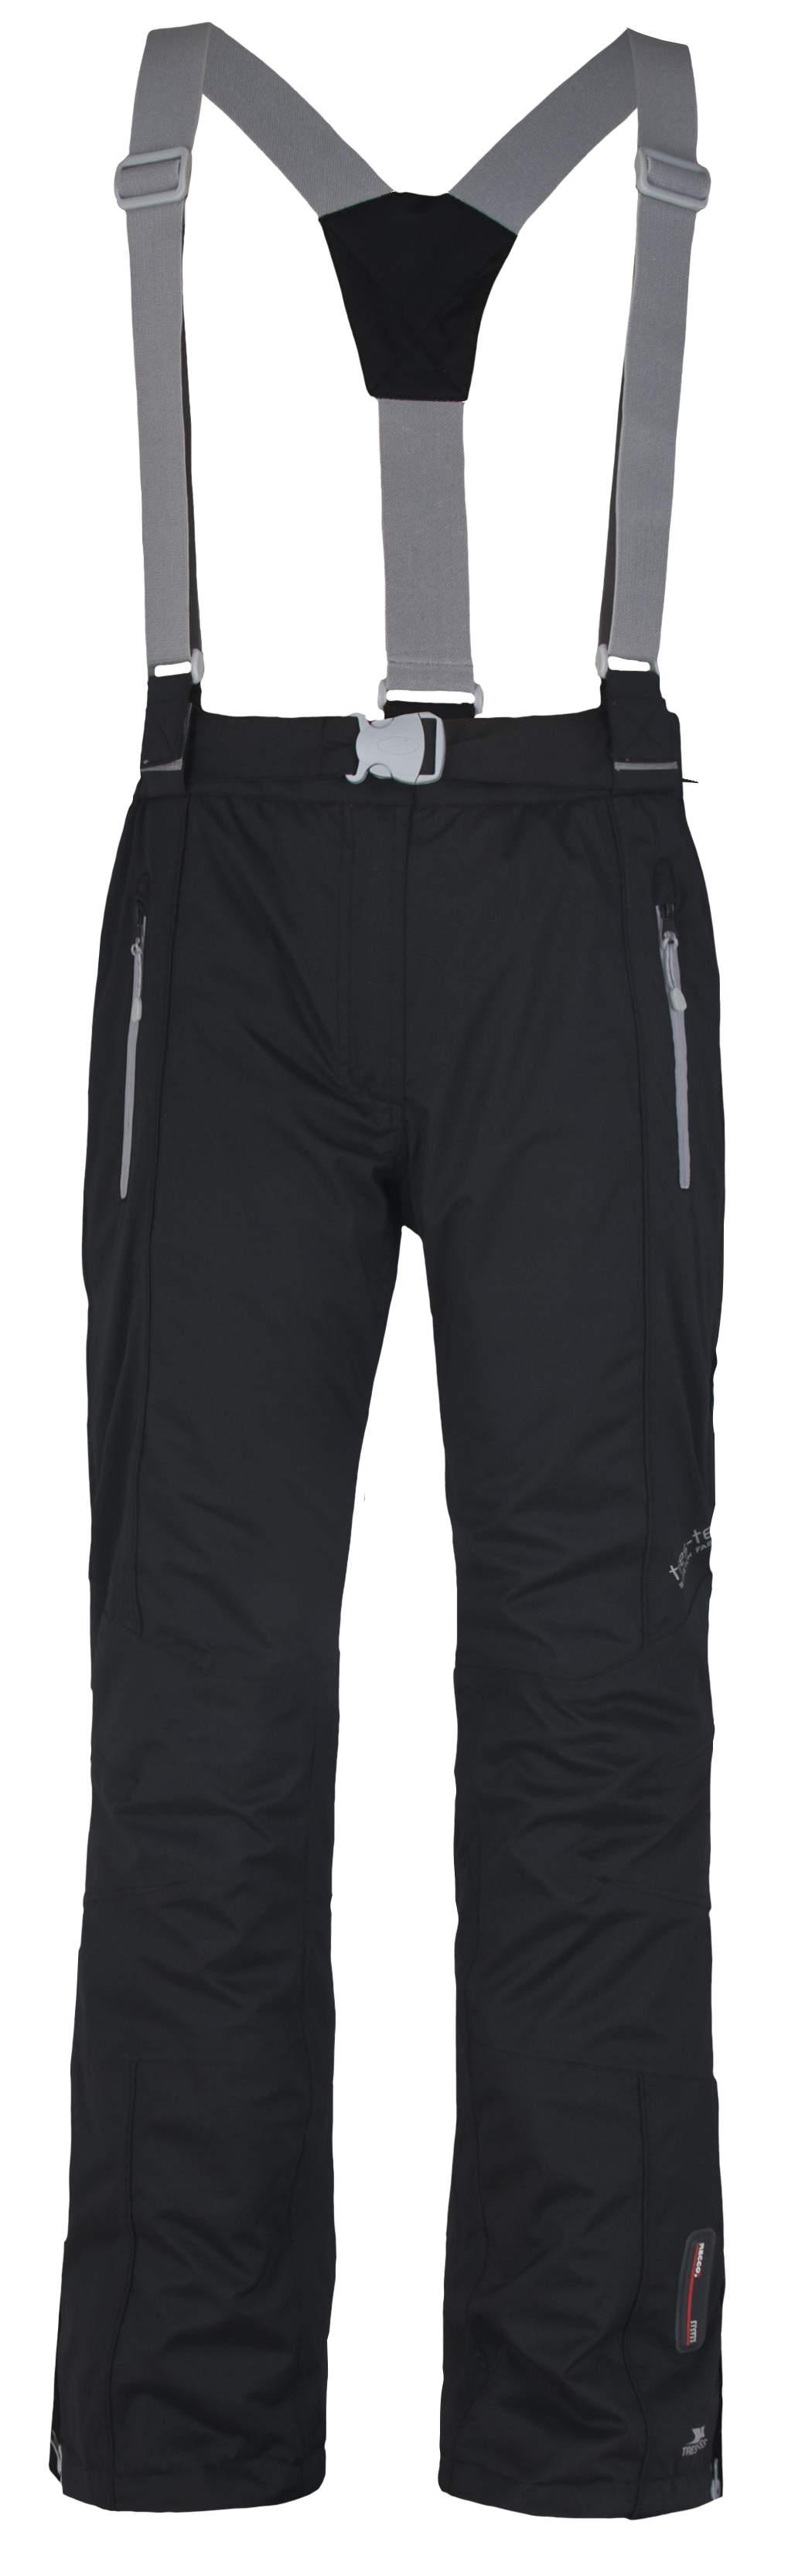 Pantaloni Ski Femei Sorana Negru